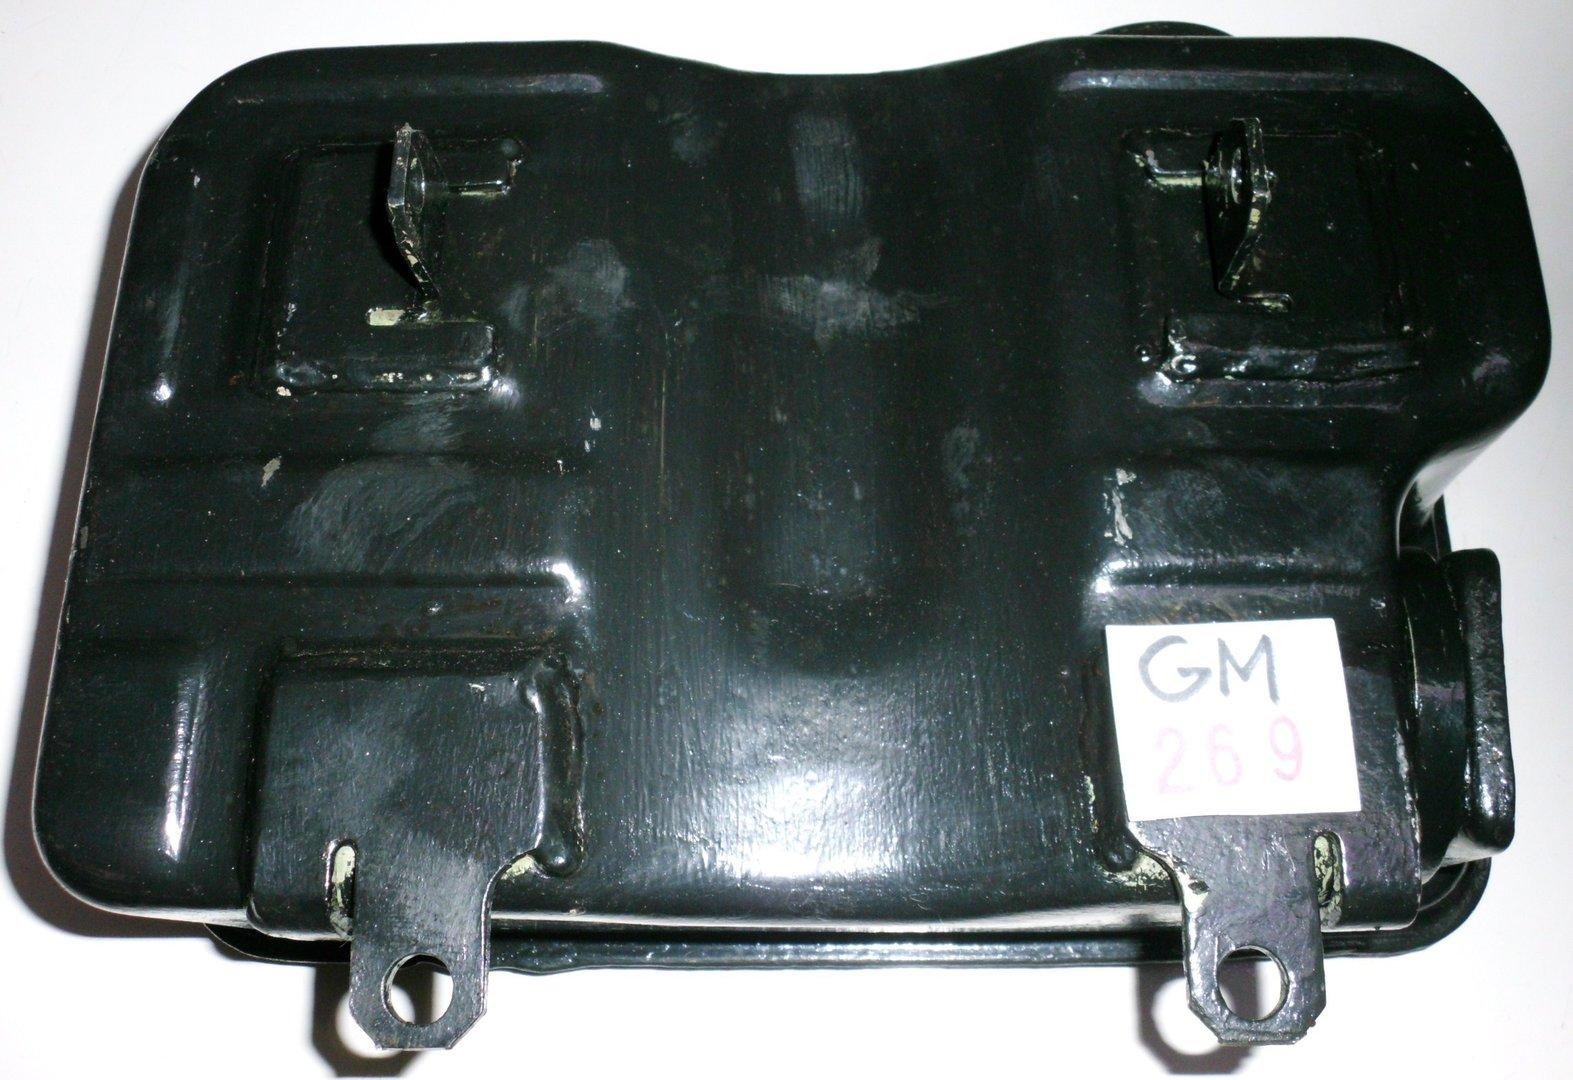 hatz motor e 75 e75 es ersatzteile dieseltank gm269. Black Bedroom Furniture Sets. Home Design Ideas